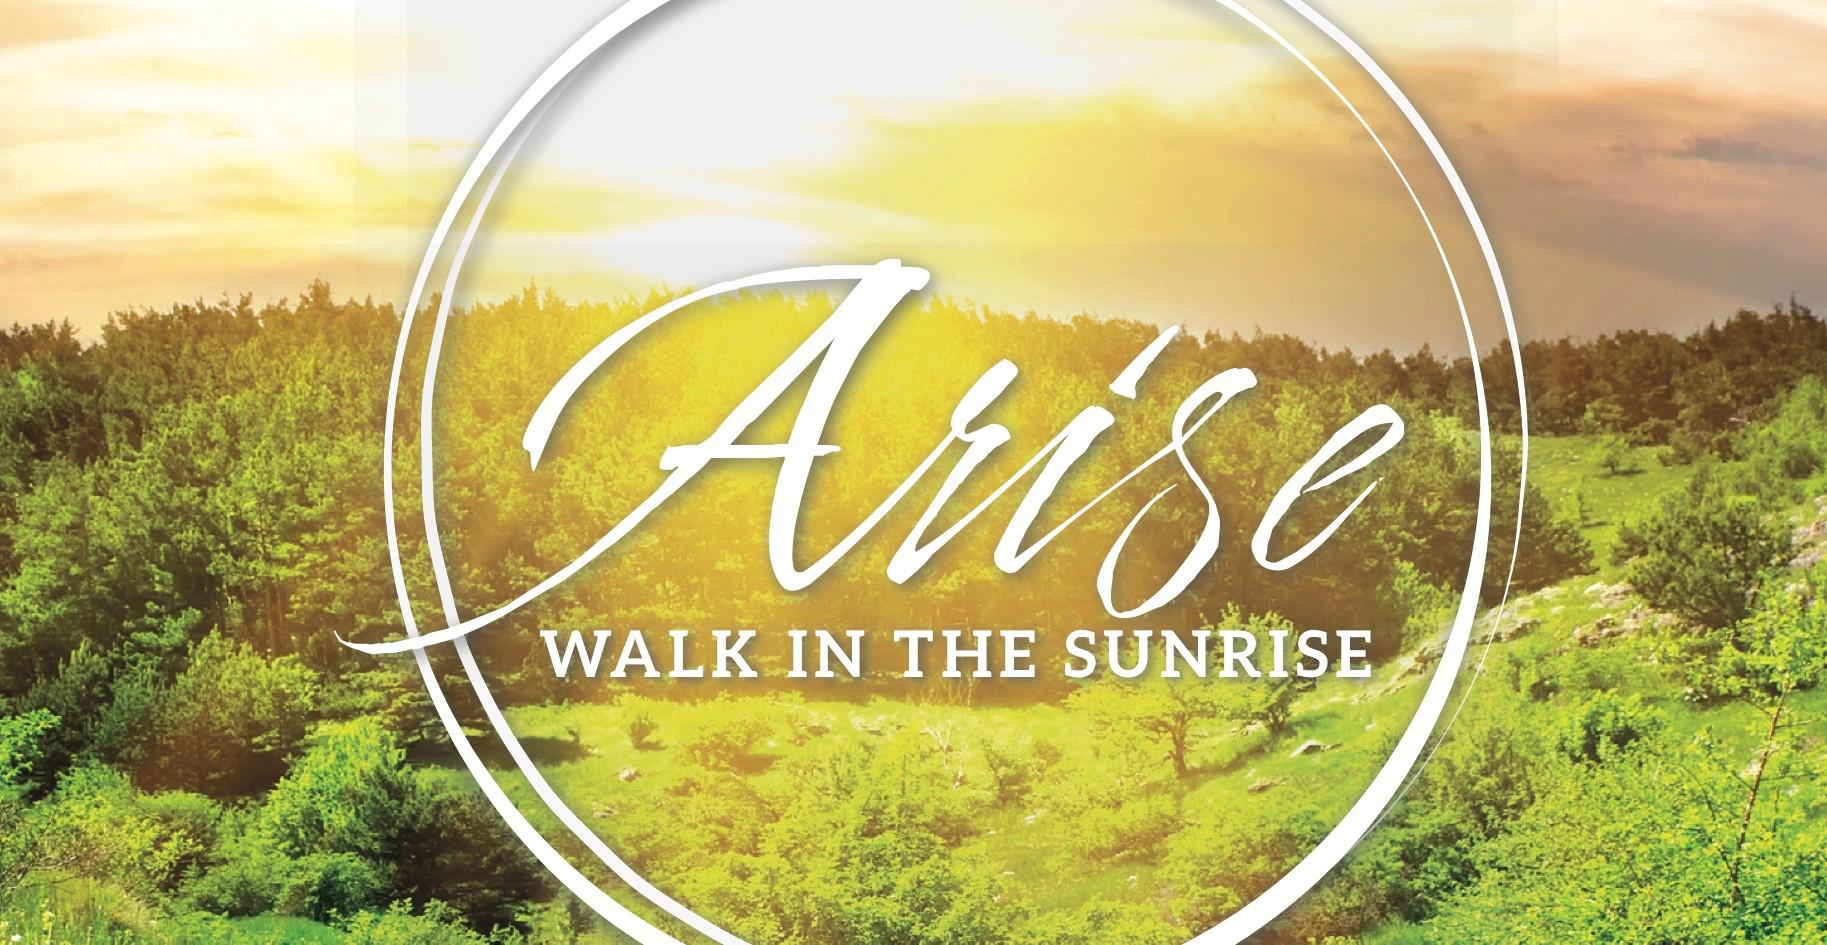 Arise! Walk in the Sunrise!